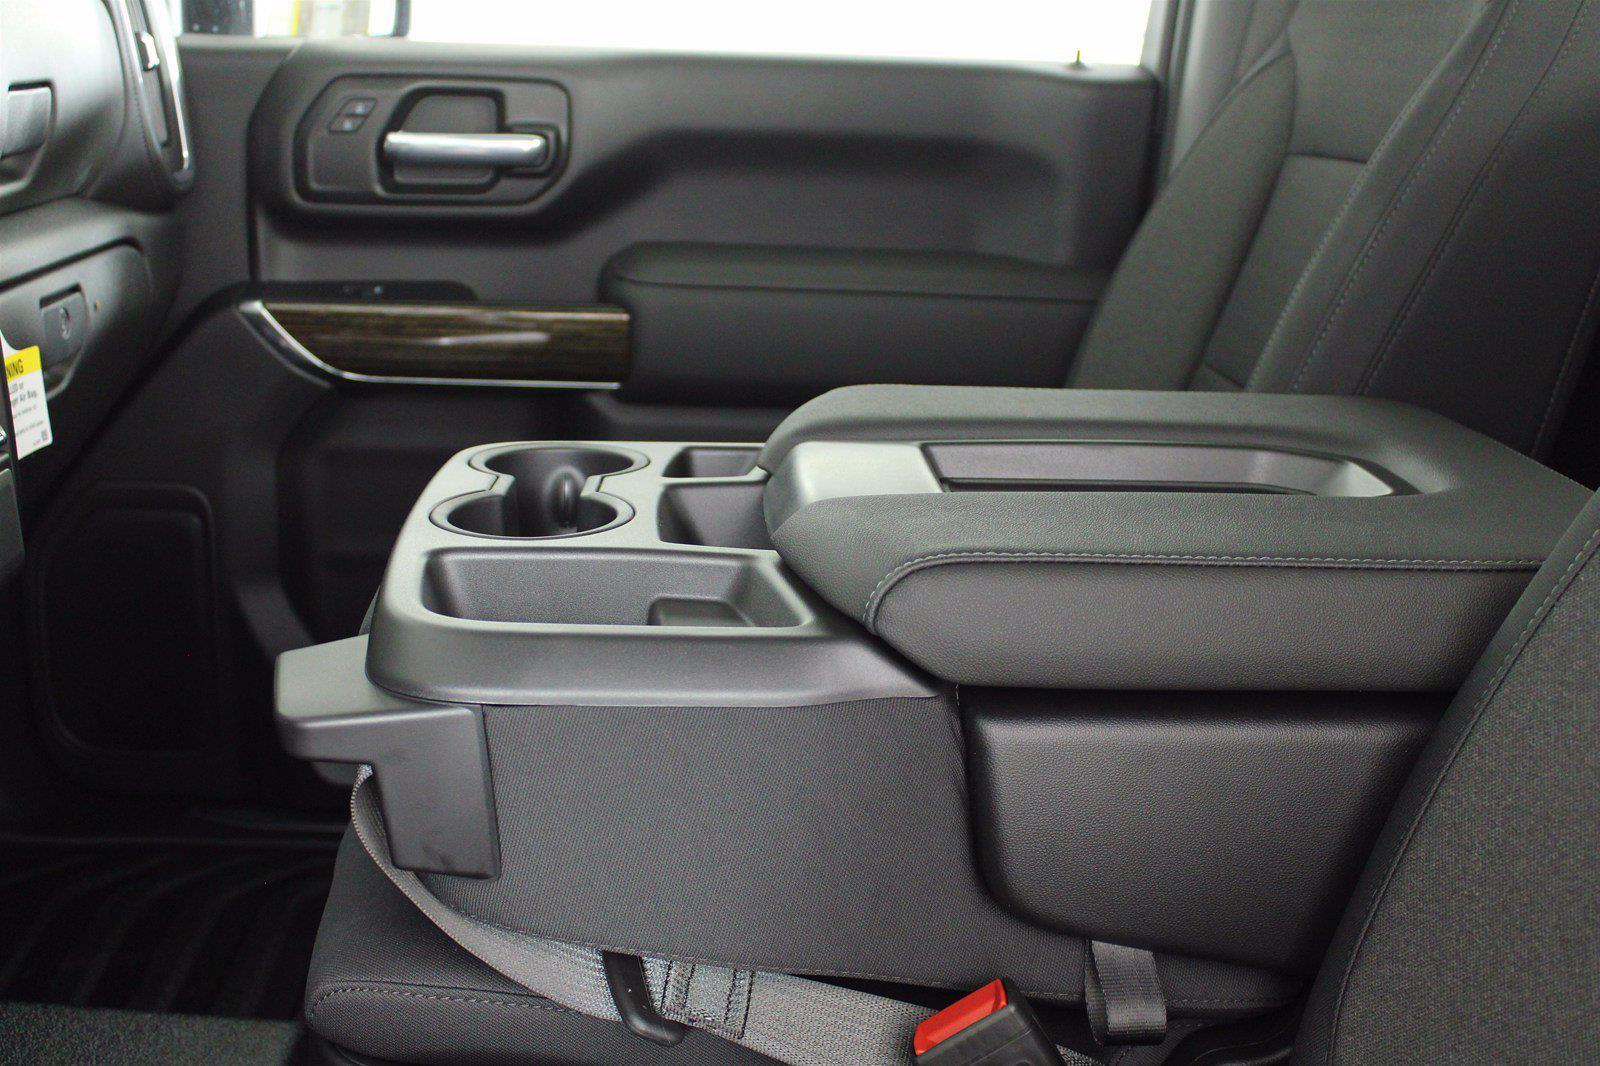 2022 Sierra 2500 Regular Cab 4x4,  Pickup #D420036 - photo 13